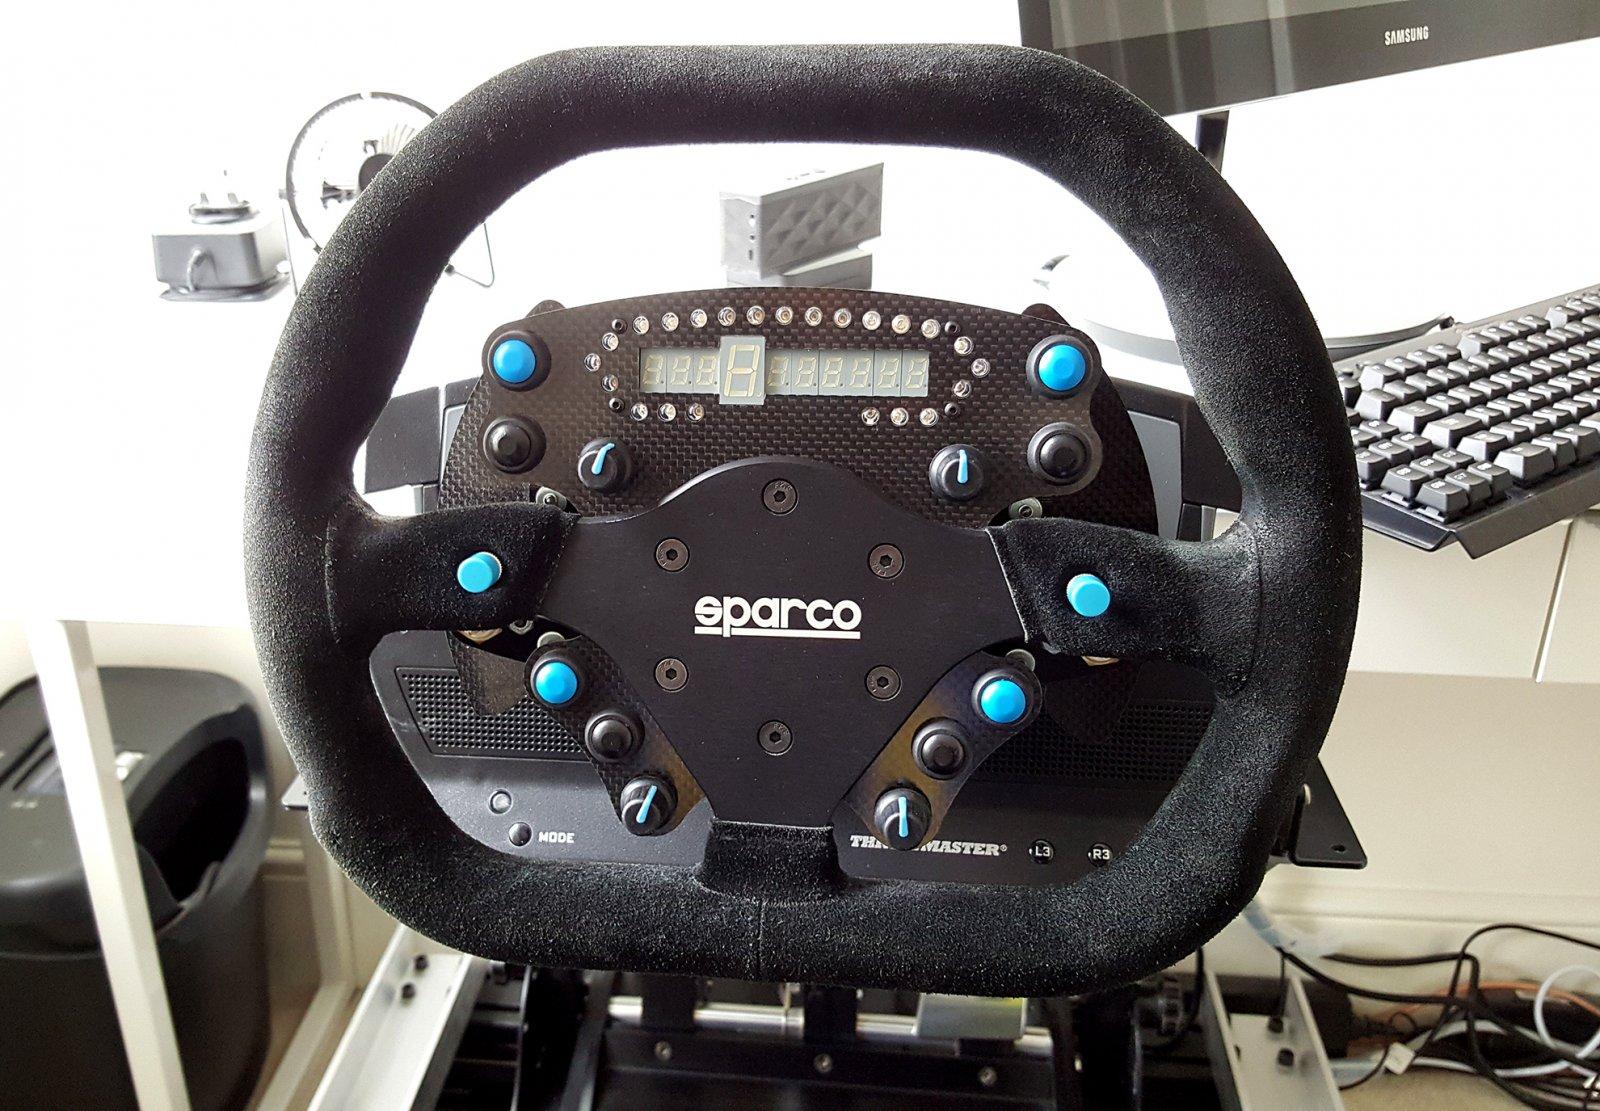 3DOF SimXperience SX3000 Motion Racing Simulator Kit - UK